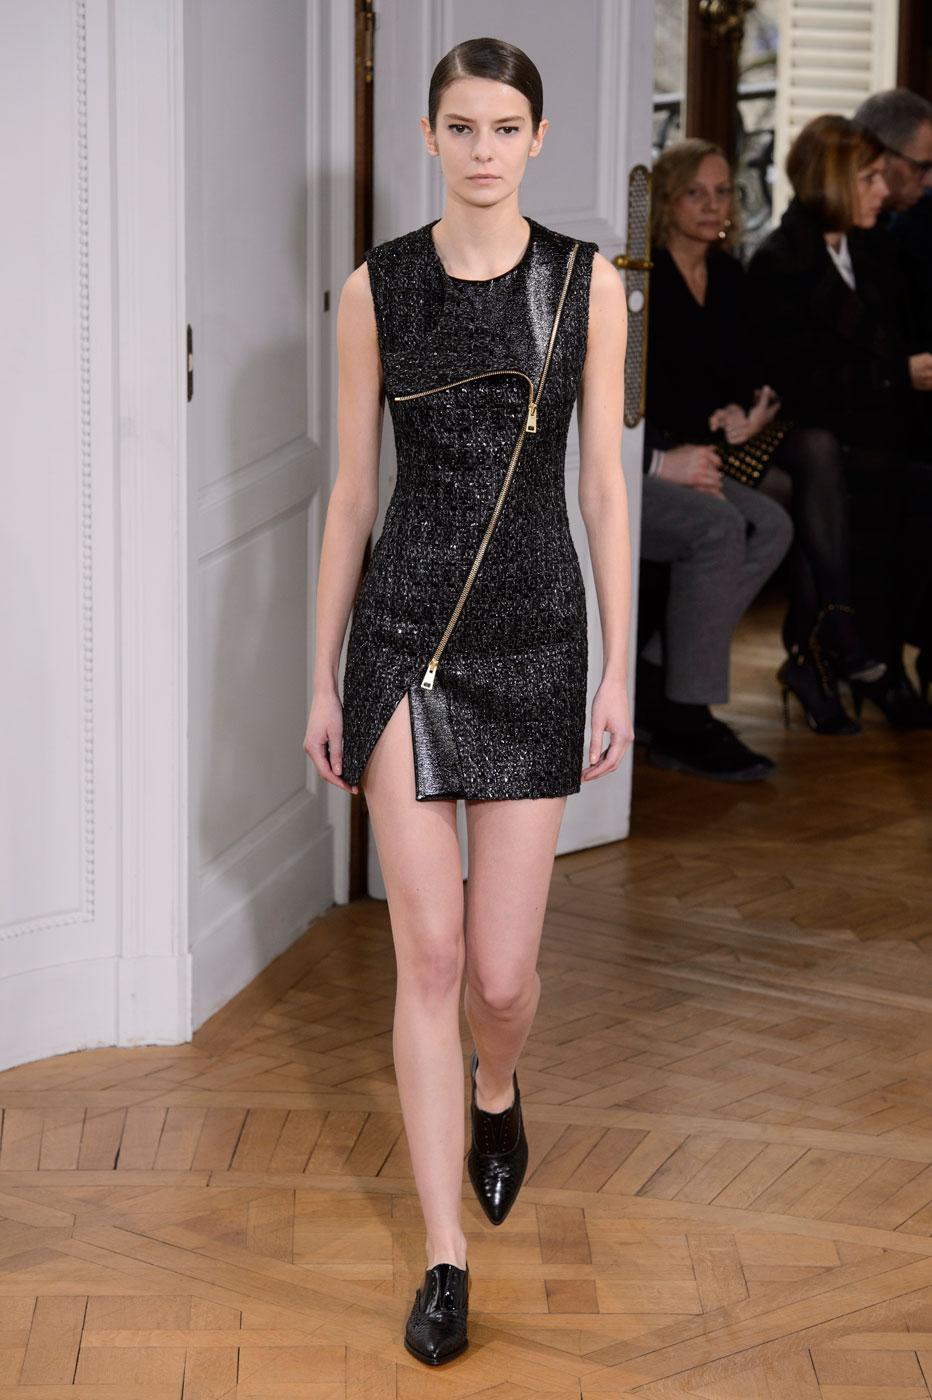 Bouchra-Jarrar-fashion-runway-show-haute-couture-paris-spring-summer-2015-the-impression-03